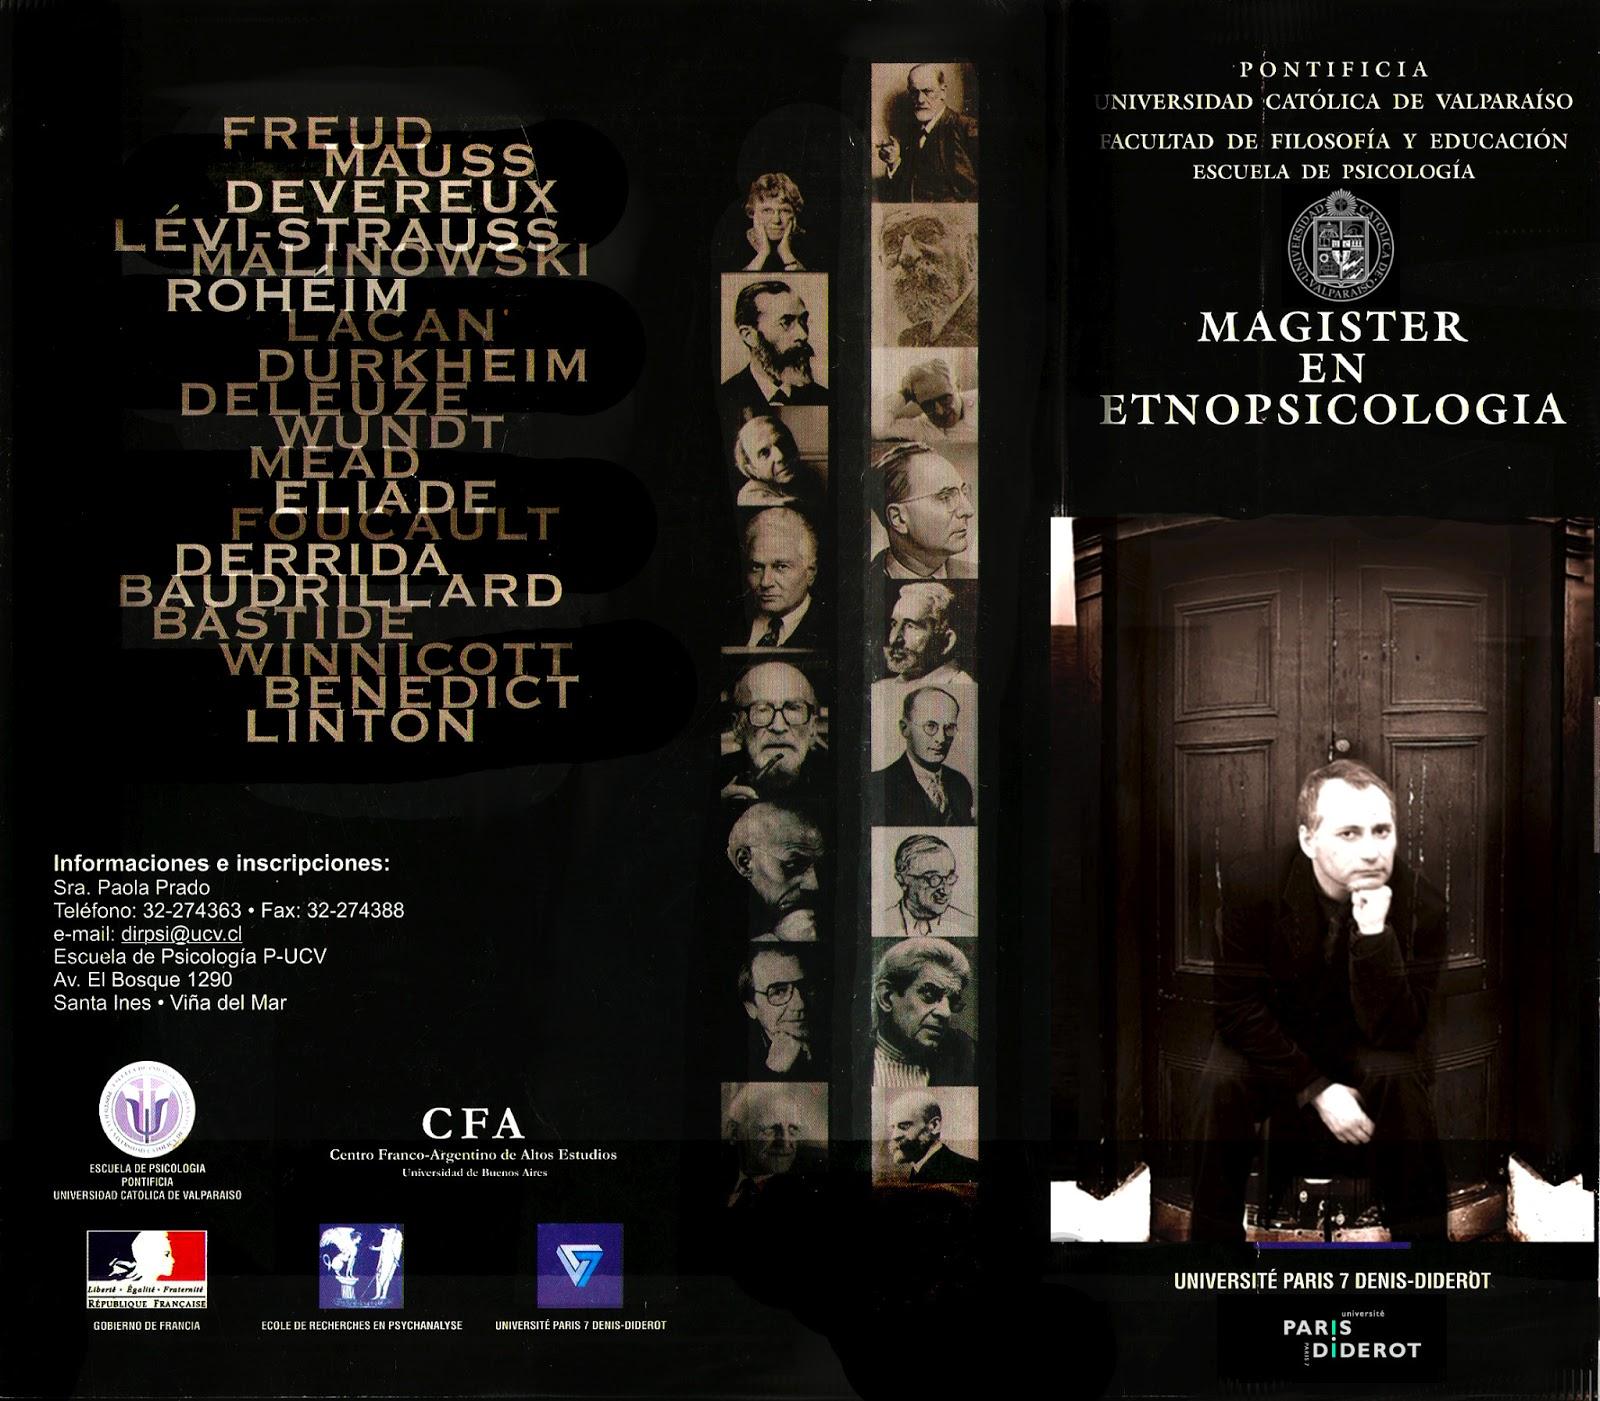 http://1.bp.blogspot.com/-WDt4ACsquso/UdkR16lEp4I/AAAAAAAAIn4/39hBhr5N-Q4/s1600/Magister+en+Etno+Psicologia_+Dr.+Adolfo+Vasquez+Rocca++PUCV+_+Triptico+700+A+.png